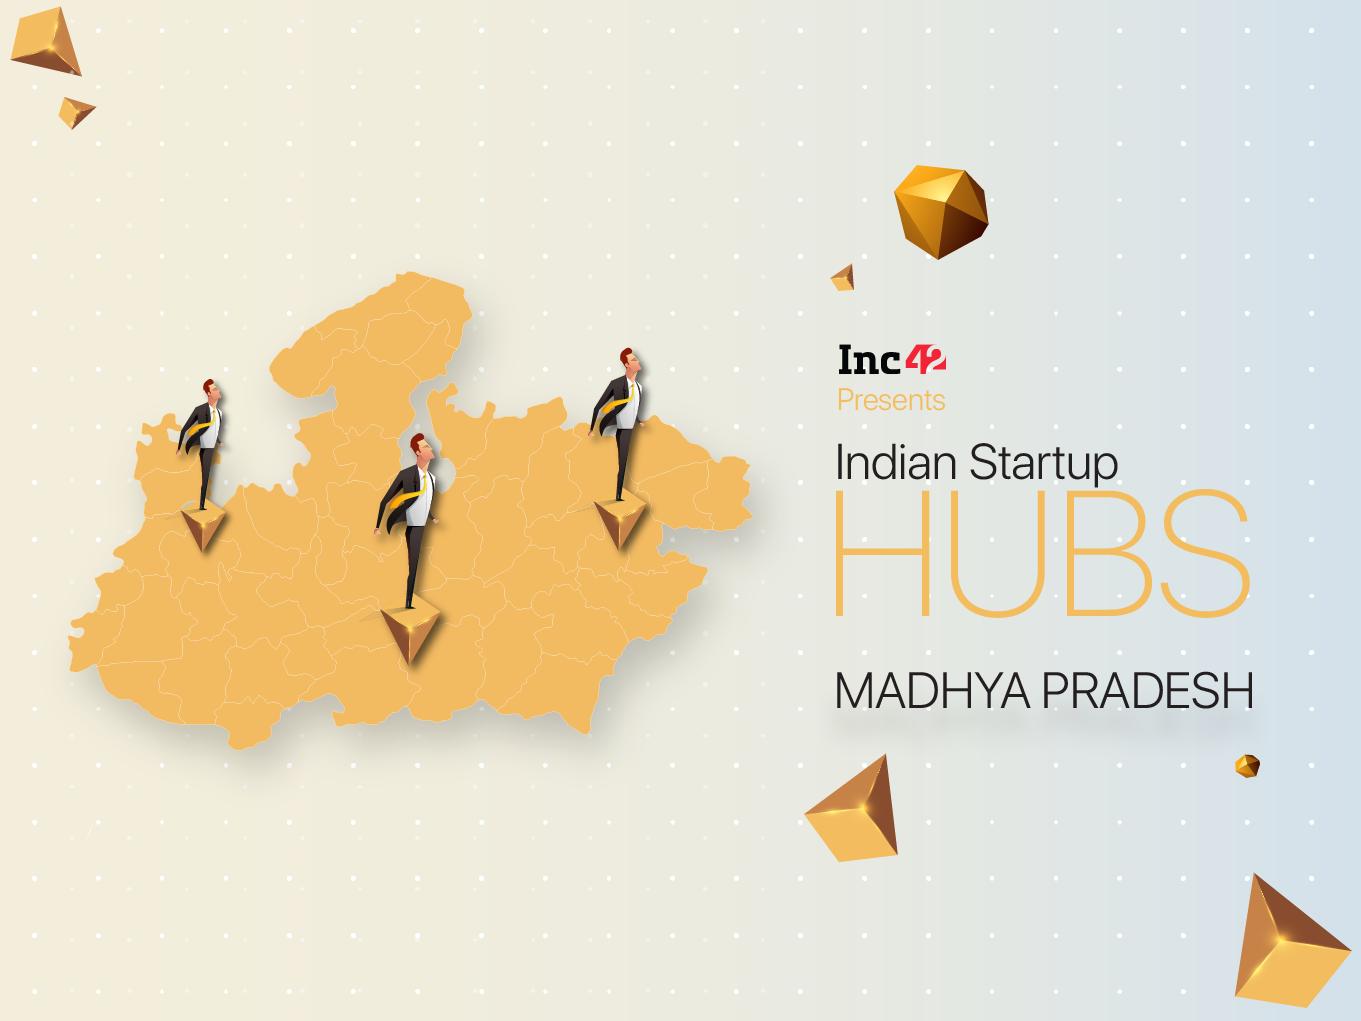 Incubators Drive Startup Growth In Madhya Pradesh